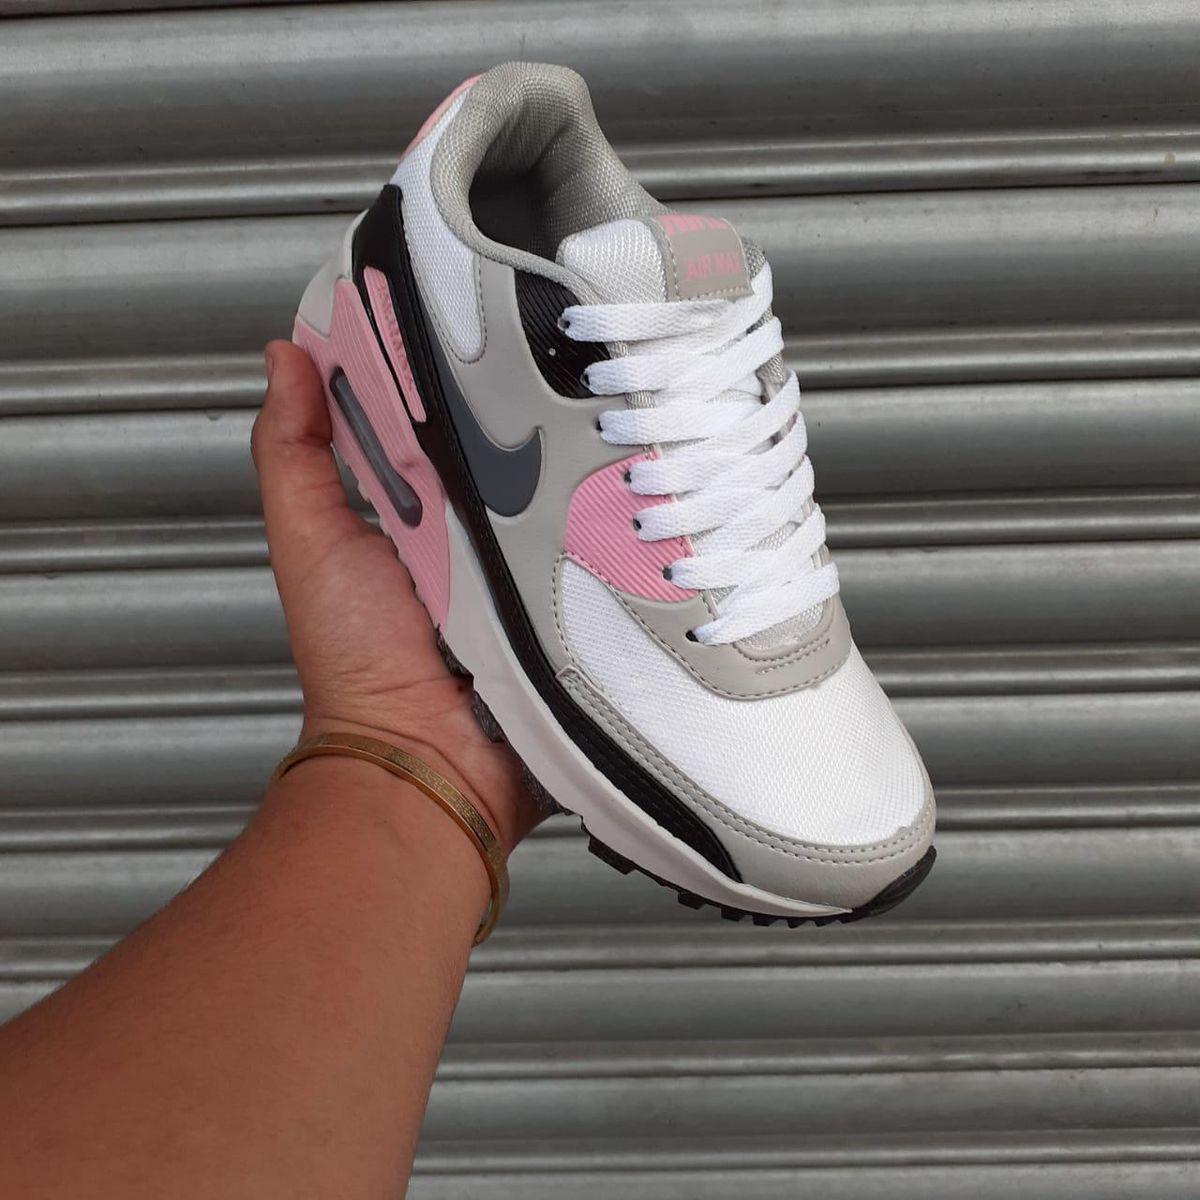 Tênis Nike Air Max 90 Cinza/rosa 37 | Tênis Feminino Nike Nunca Usado 43313807 | enjoei